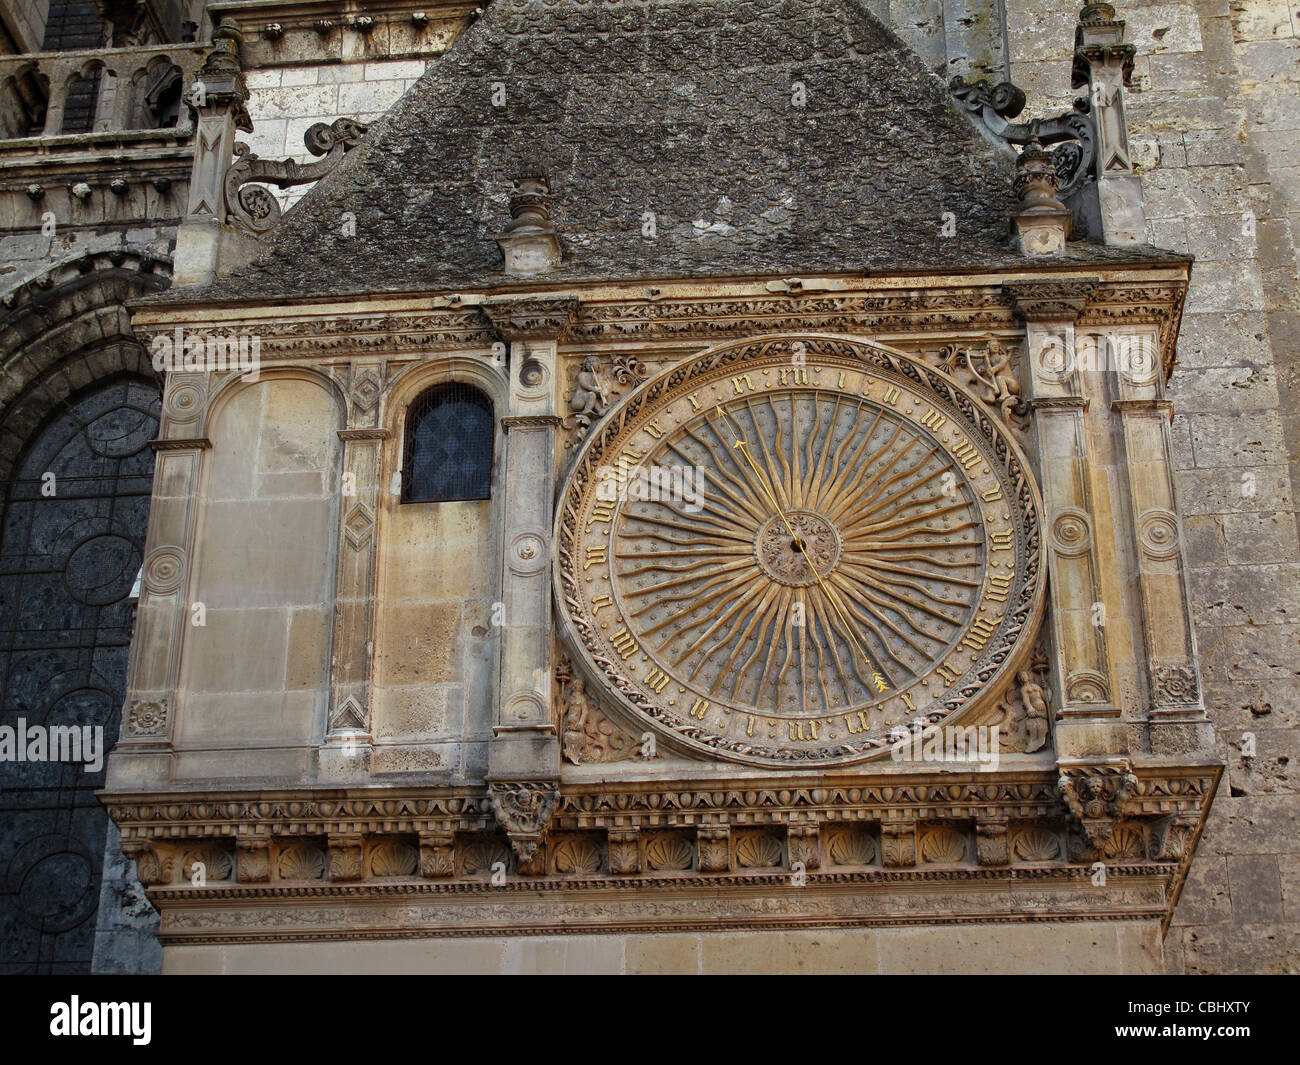 The big clock of Notre-Dame de Chartres cathedral,Chartres,Eure-et-Loire,France,Way of St James to Santiago de Compostela,UNESCO - Stock Image